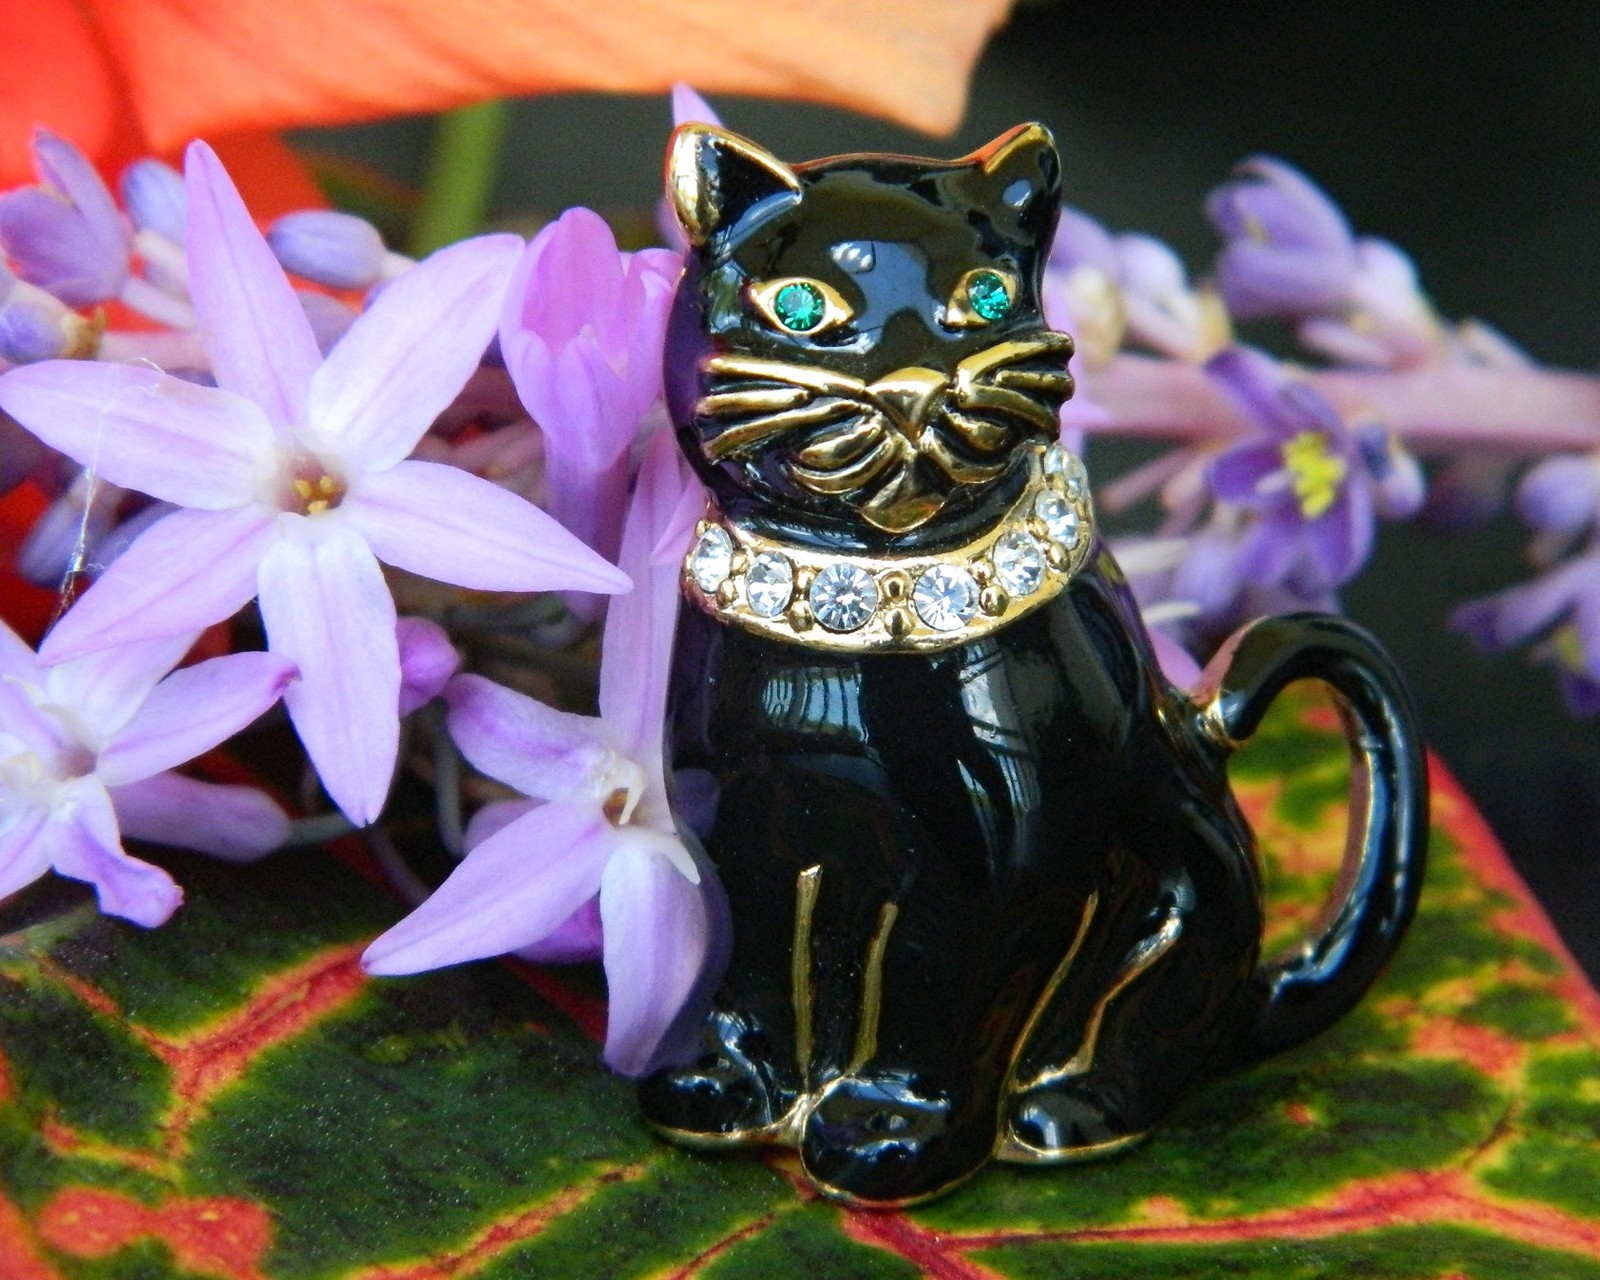 Vintage Monet Black Cat Brooch Pin Enamel Rhinestones Collar Figural image 5